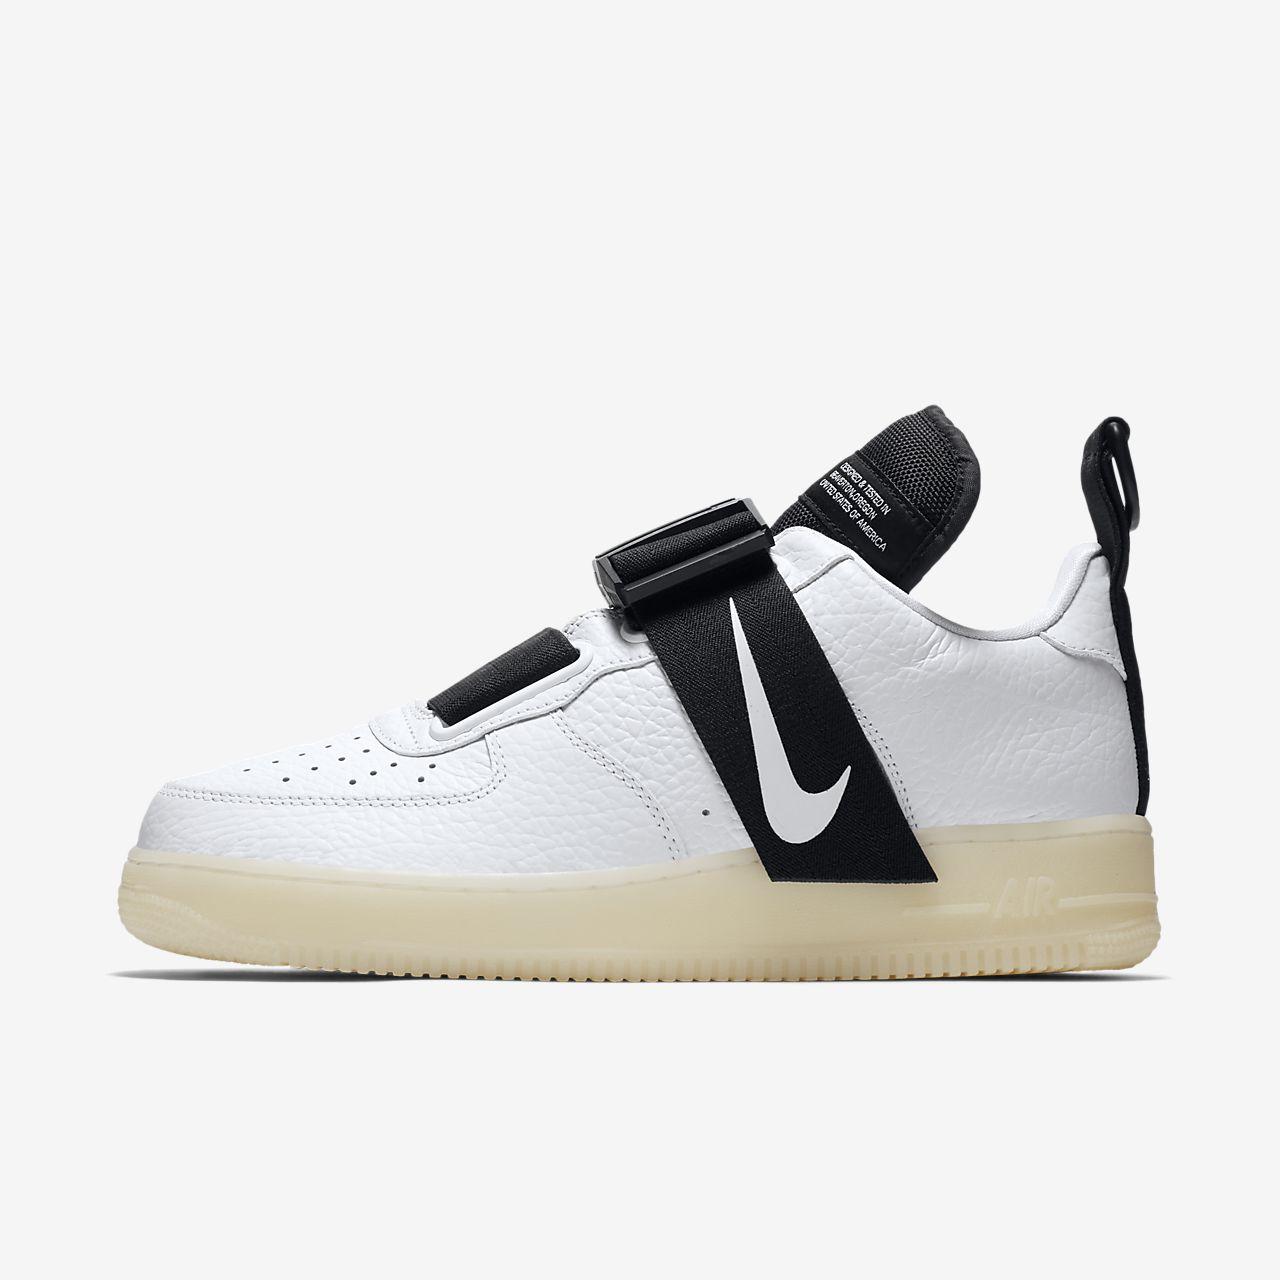 9a3864dc25bbb Nike Air Force 1 Utility QS Men's Shoe. Nike.com ID